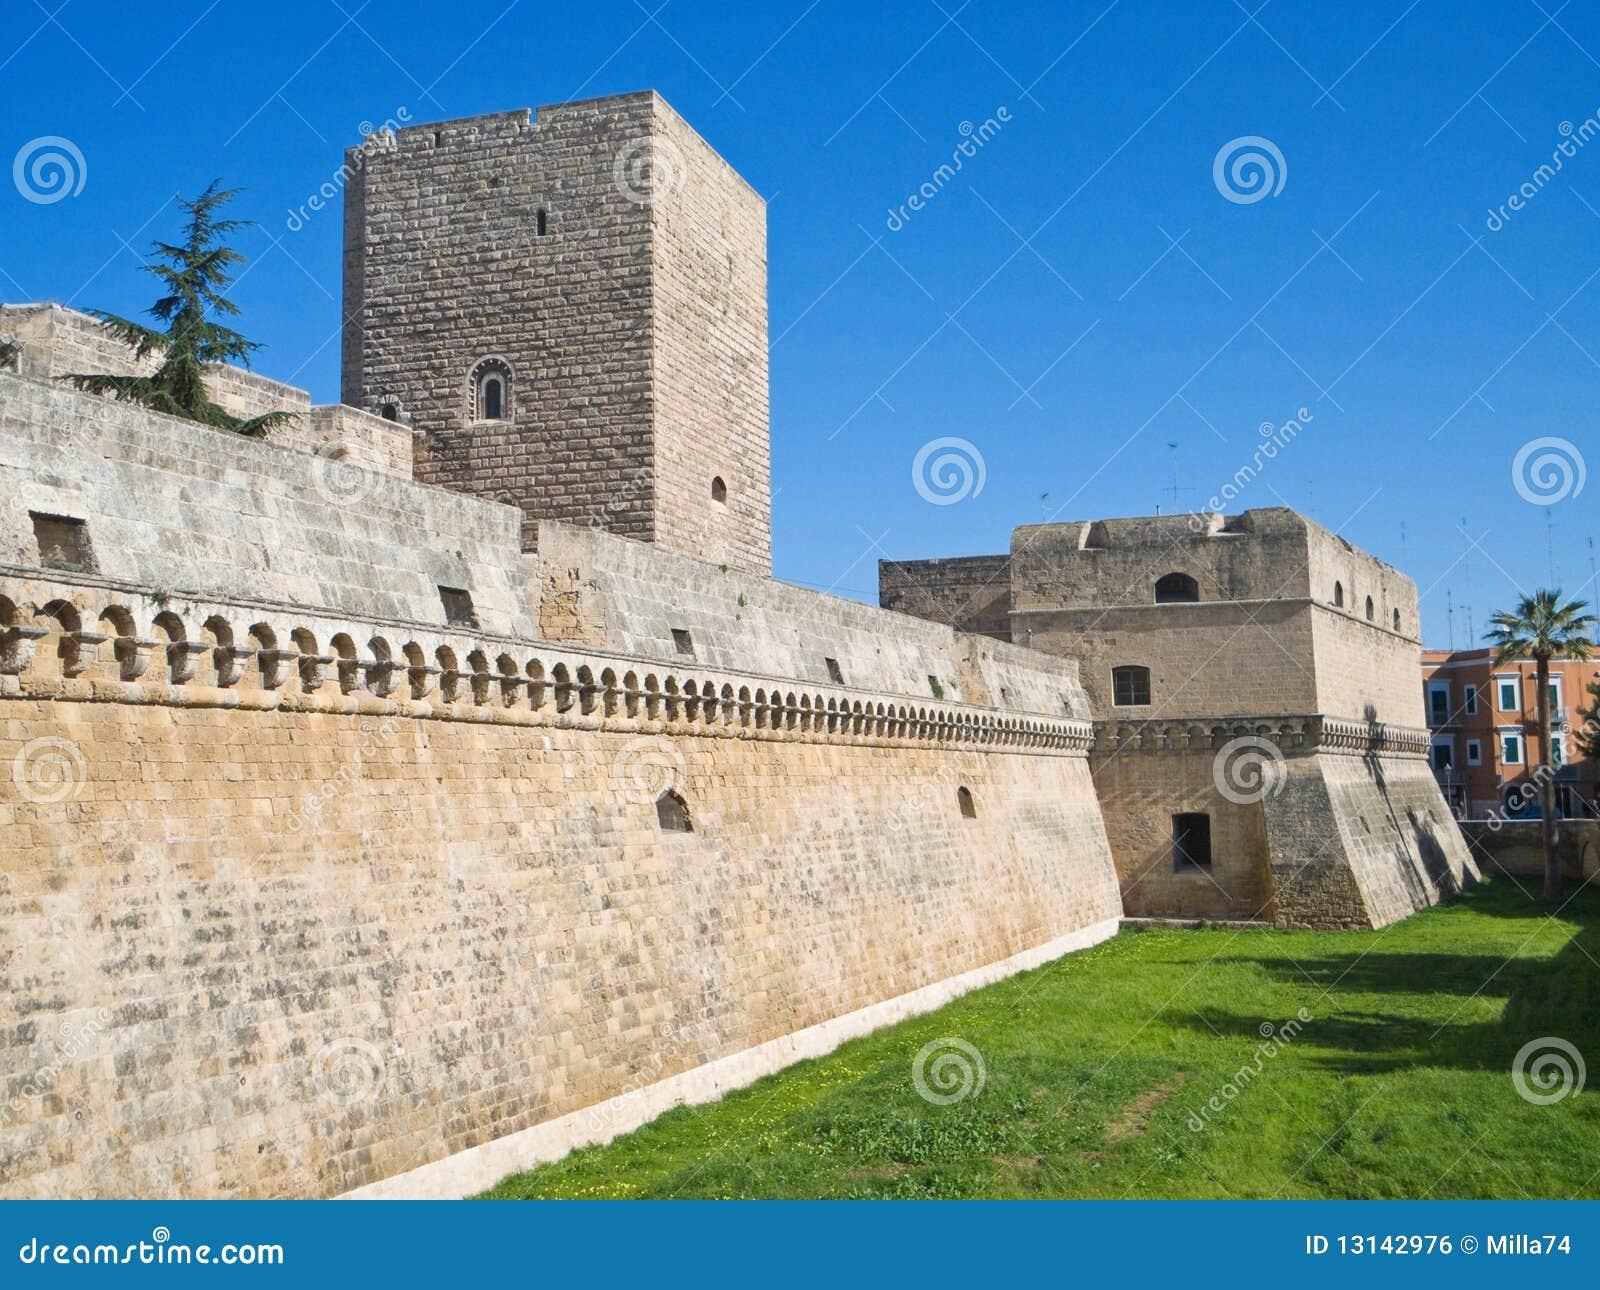 Apuliabari slott norman swabian